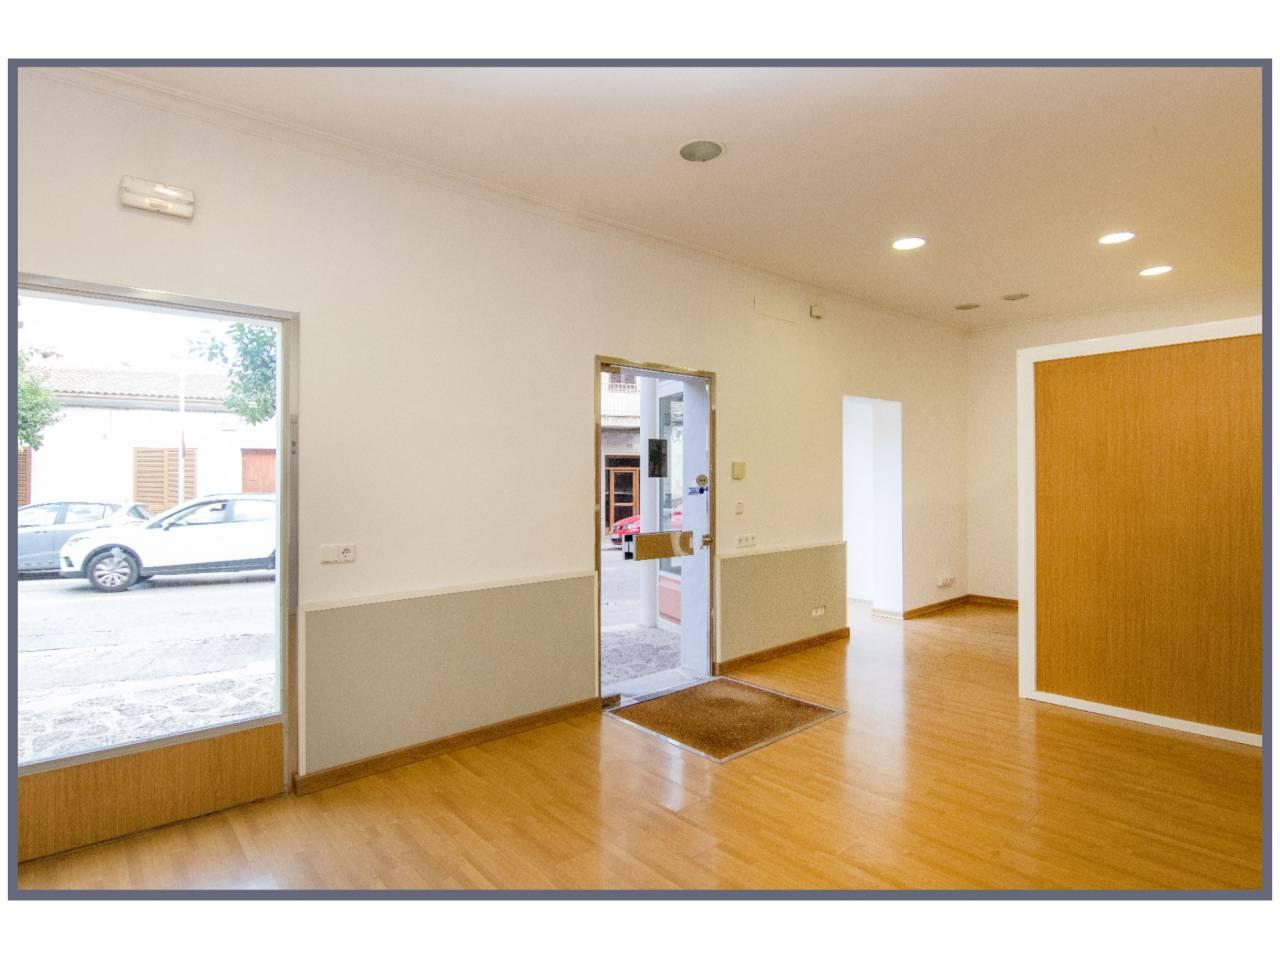 Rent Business premise  Avenida lluc, s/n. Se alquila local comercial de 48 m2 aproximadamente en la ciudad